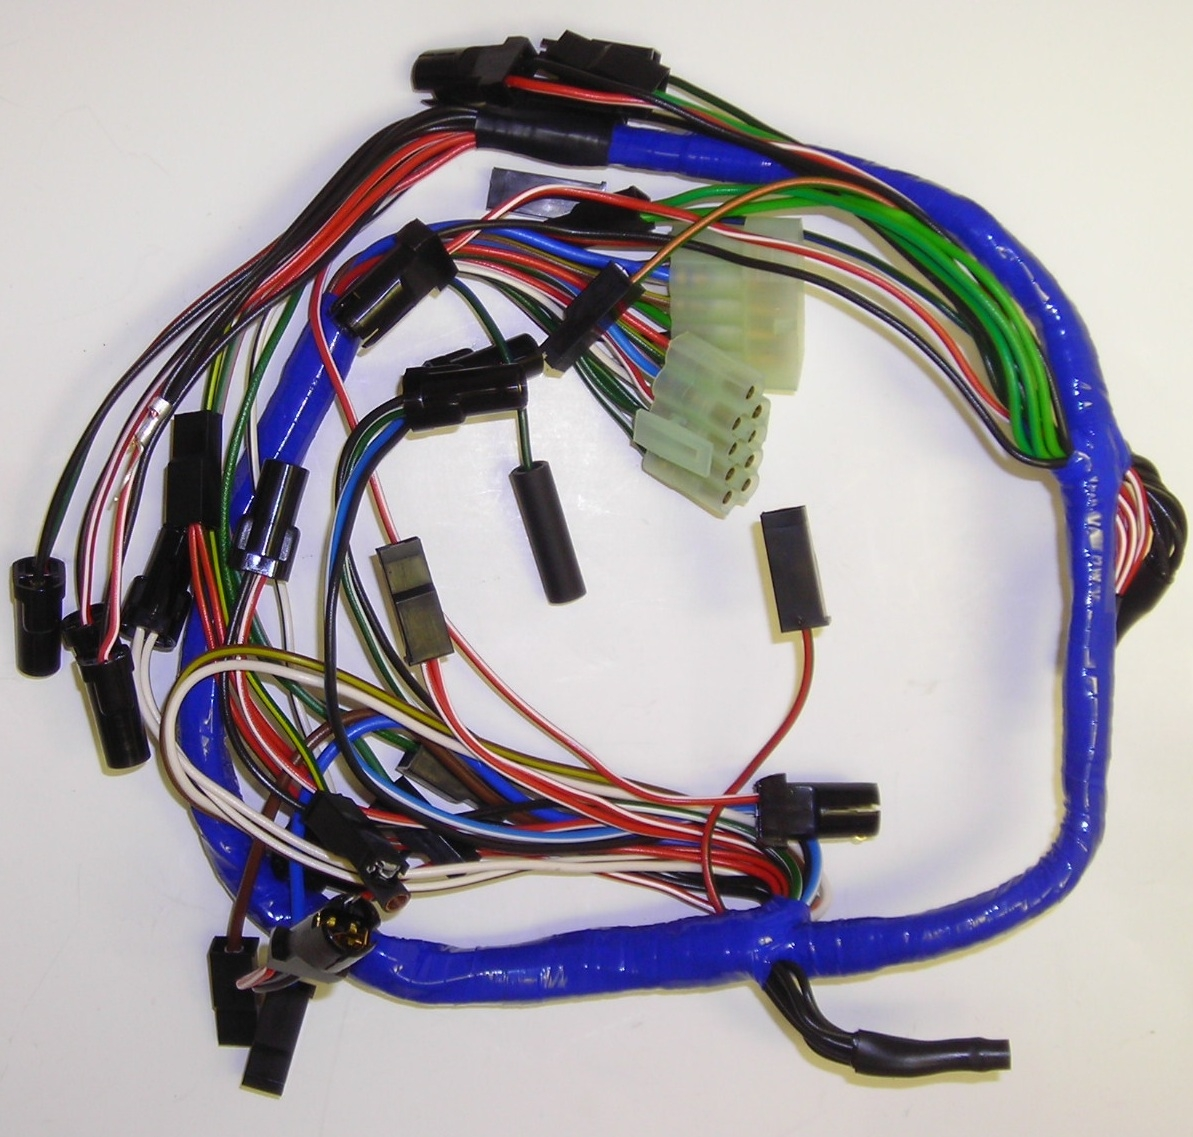 dashboard wiring harness mg midget 1977 80 dashboard wiring harness [ 1193 x 1137 Pixel ]